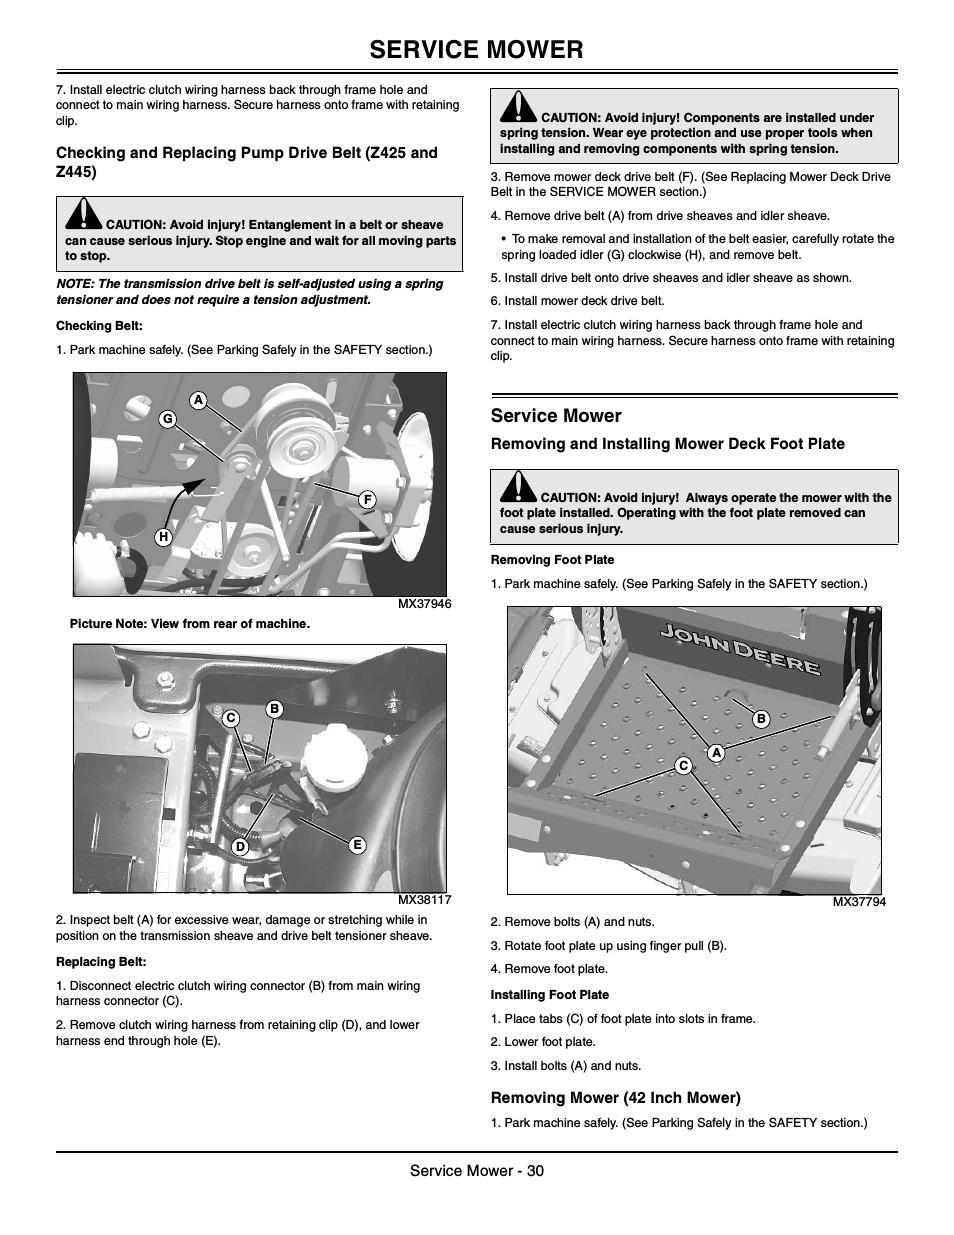 Z425 Wiring Diagram | Wiring Library - John Deere Z425 Wiring Diagram